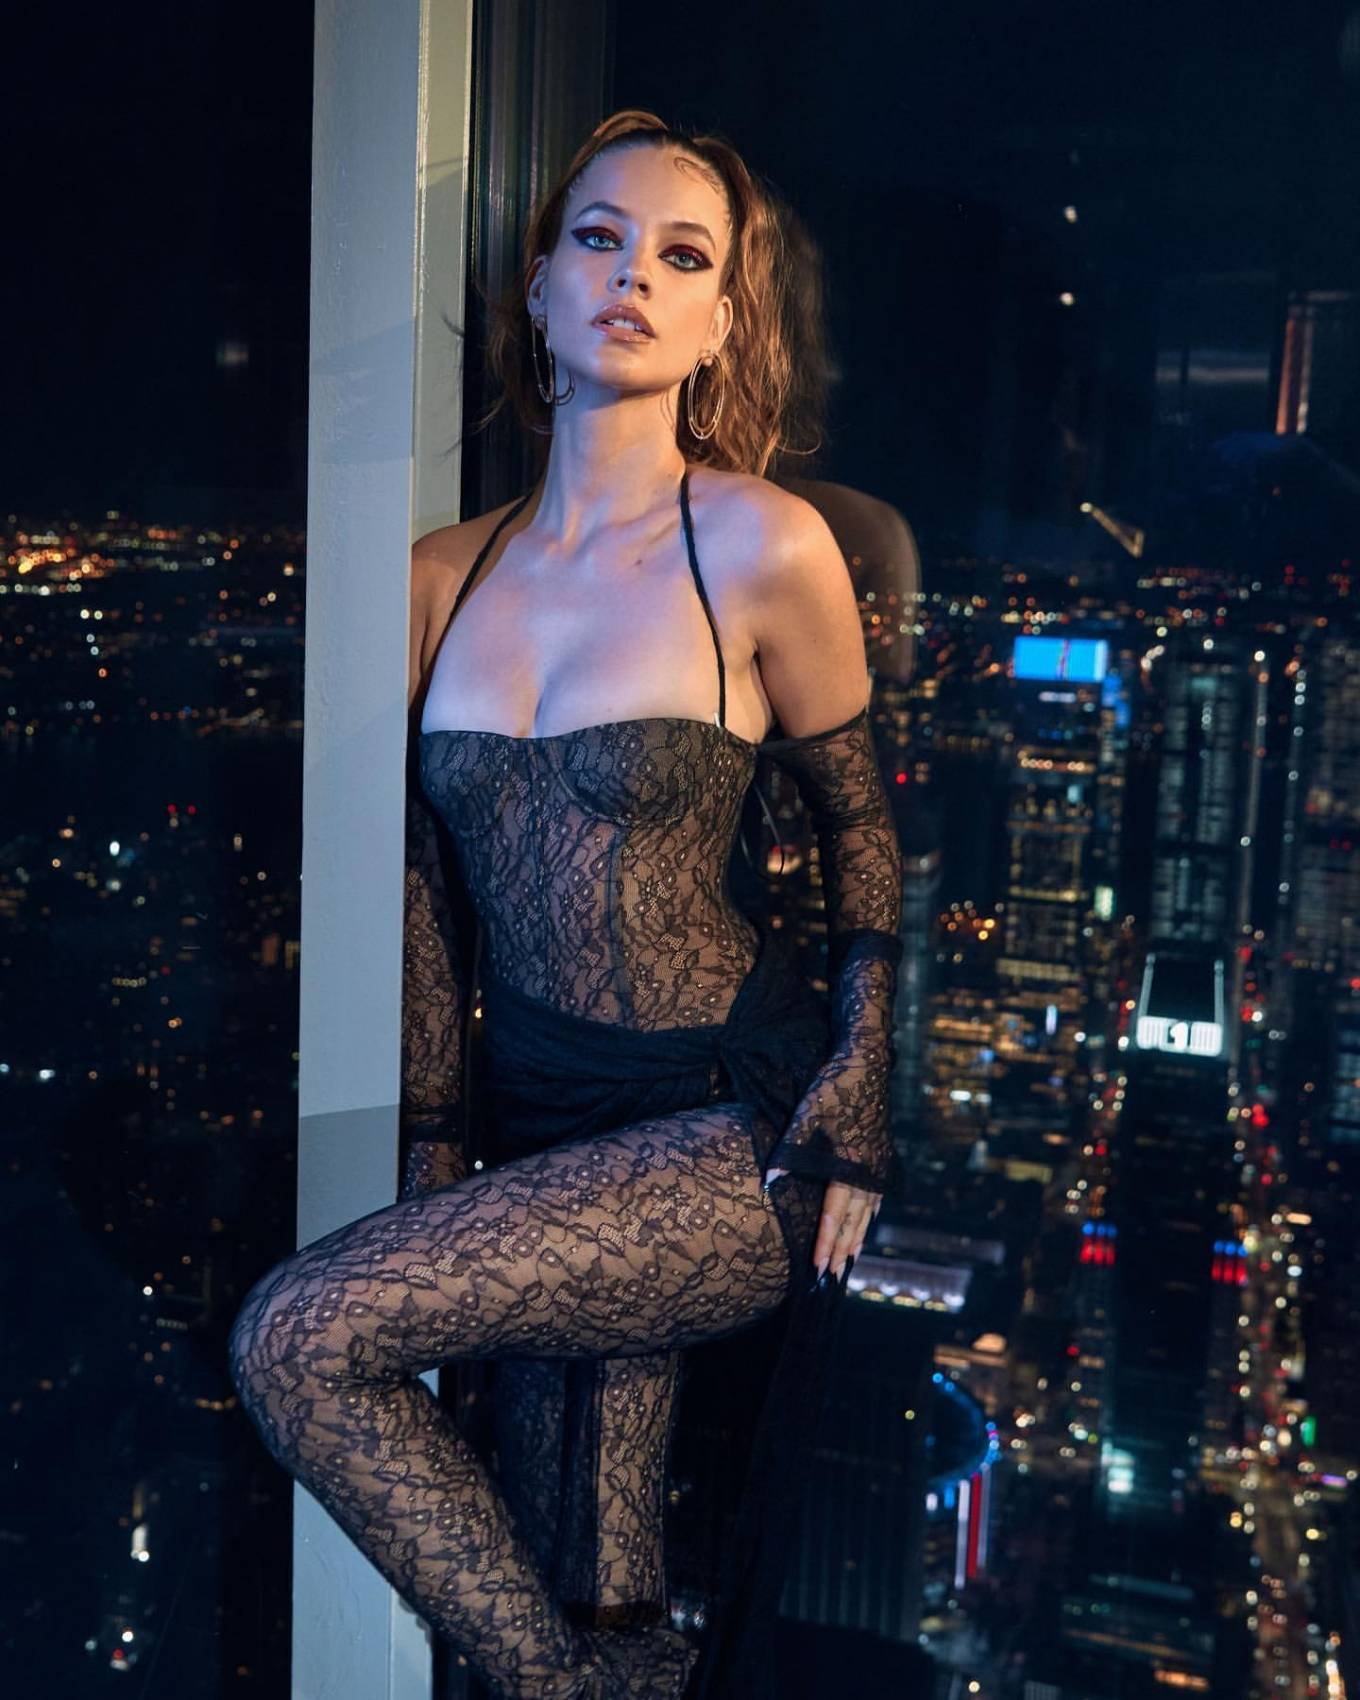 Barbara Palvin - Greg Swales photoshoot in New York September 2021